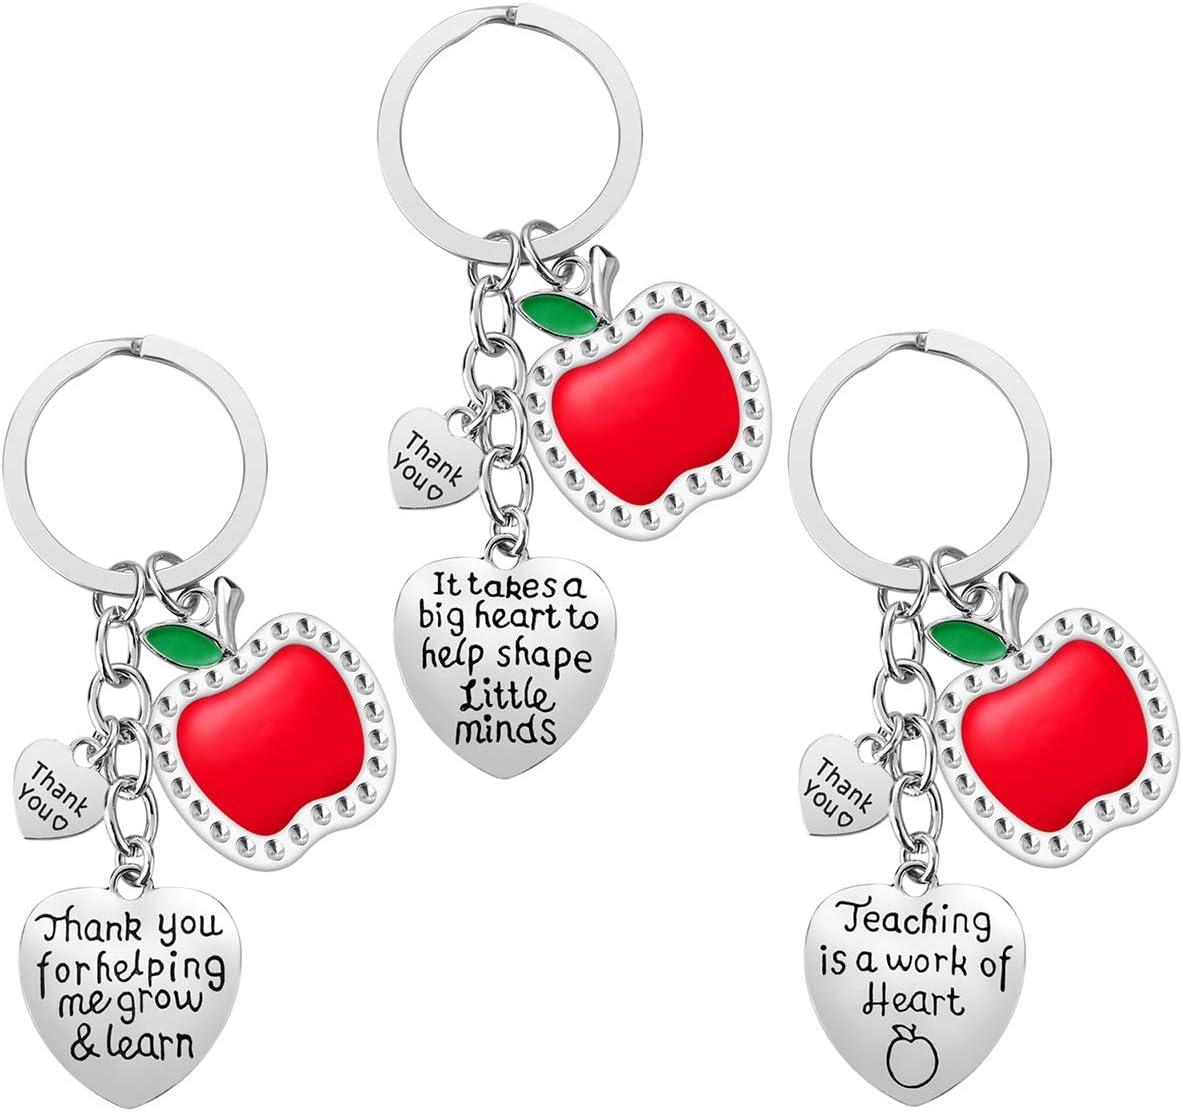 Teacher Appreciation Gift for Women, 3pcs Heart Pendant Teacher Keychain Set, Jewelry Gift for Teachers, Birthday Gift for Teacher Valentines Gifts